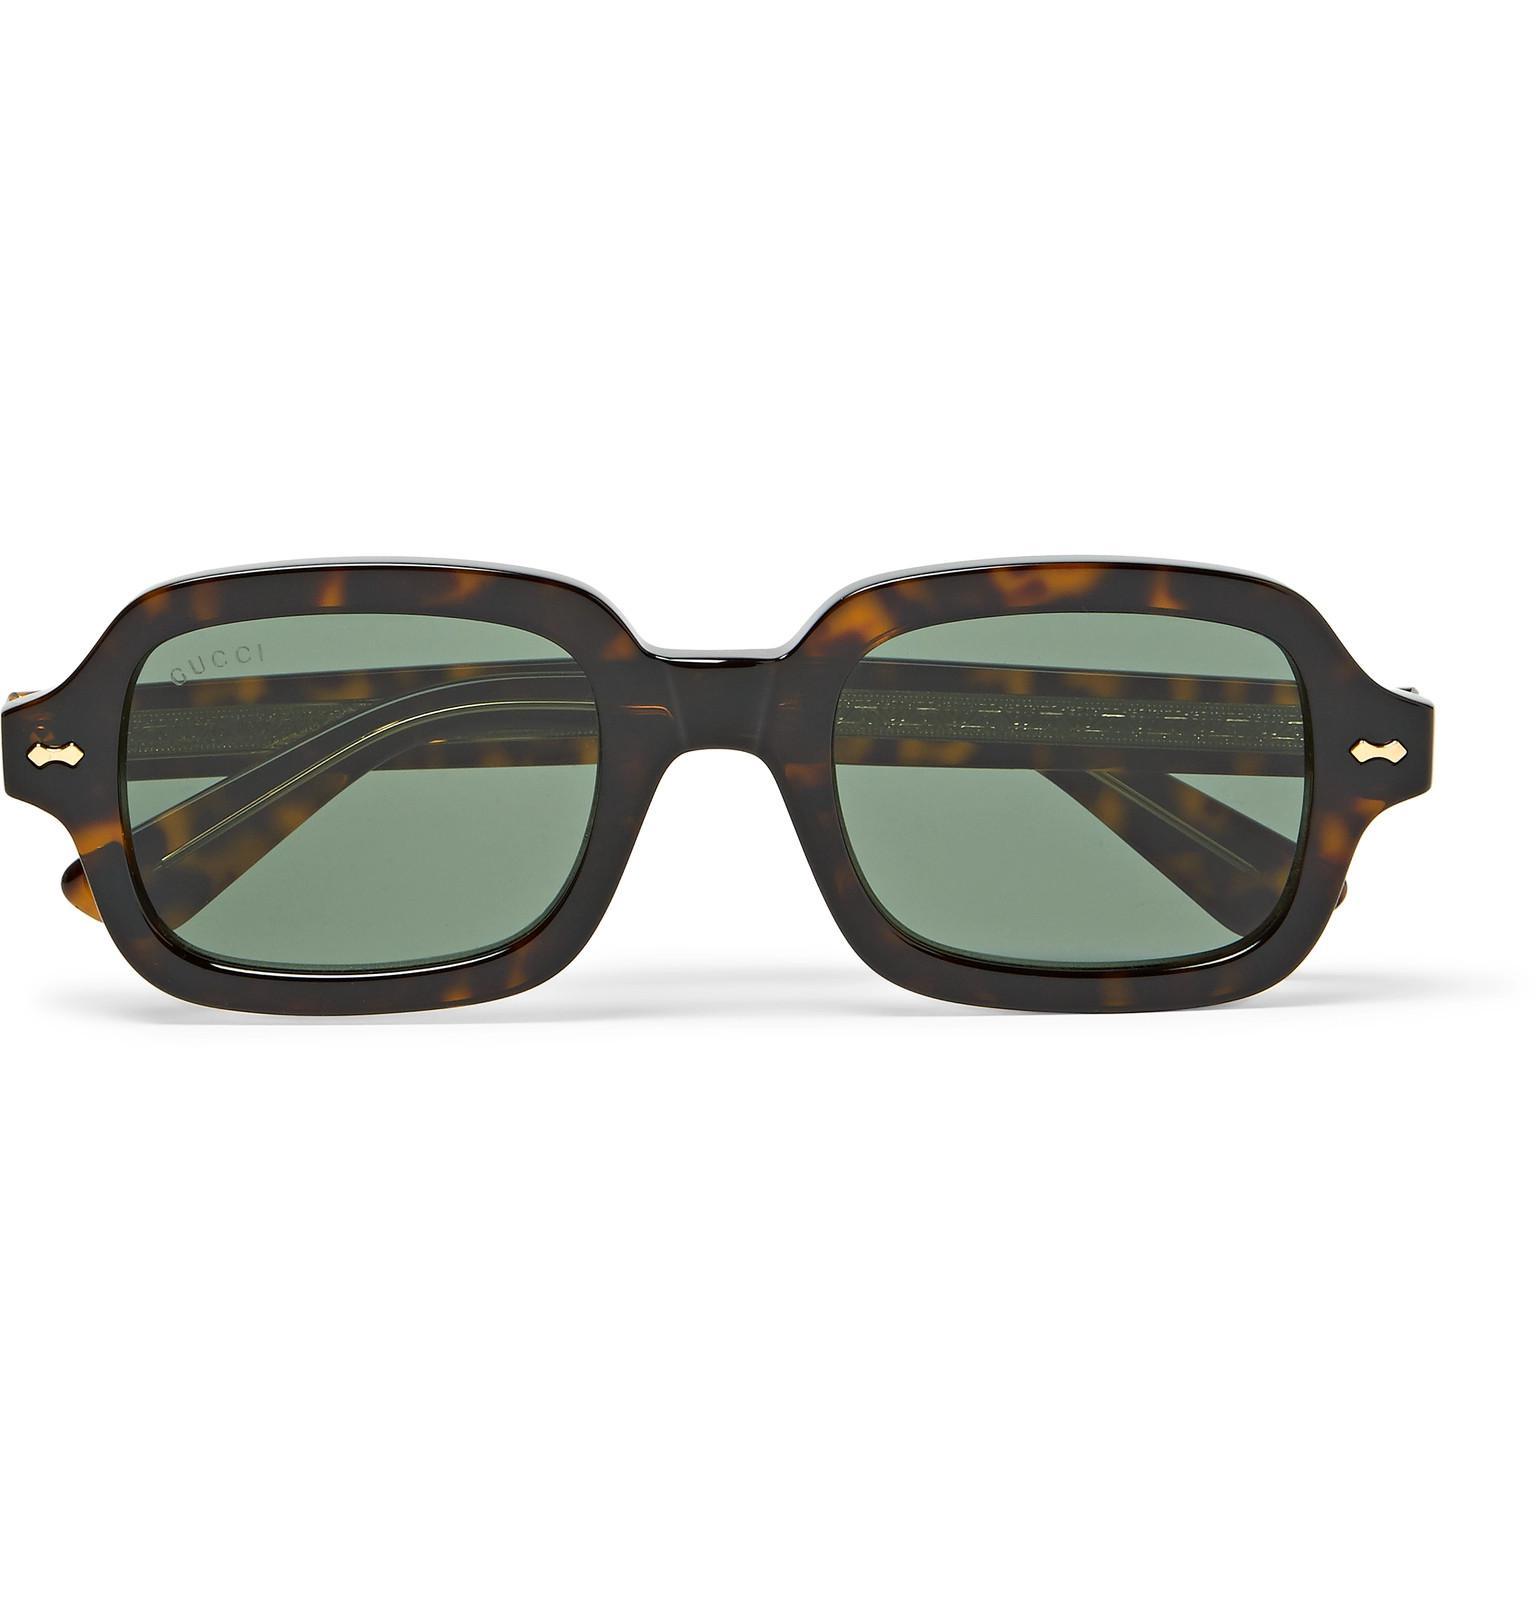 bdd90f05d5 Gucci Square-frame Tortoiseshell Acetate Sunglasses in Brown for Men ...